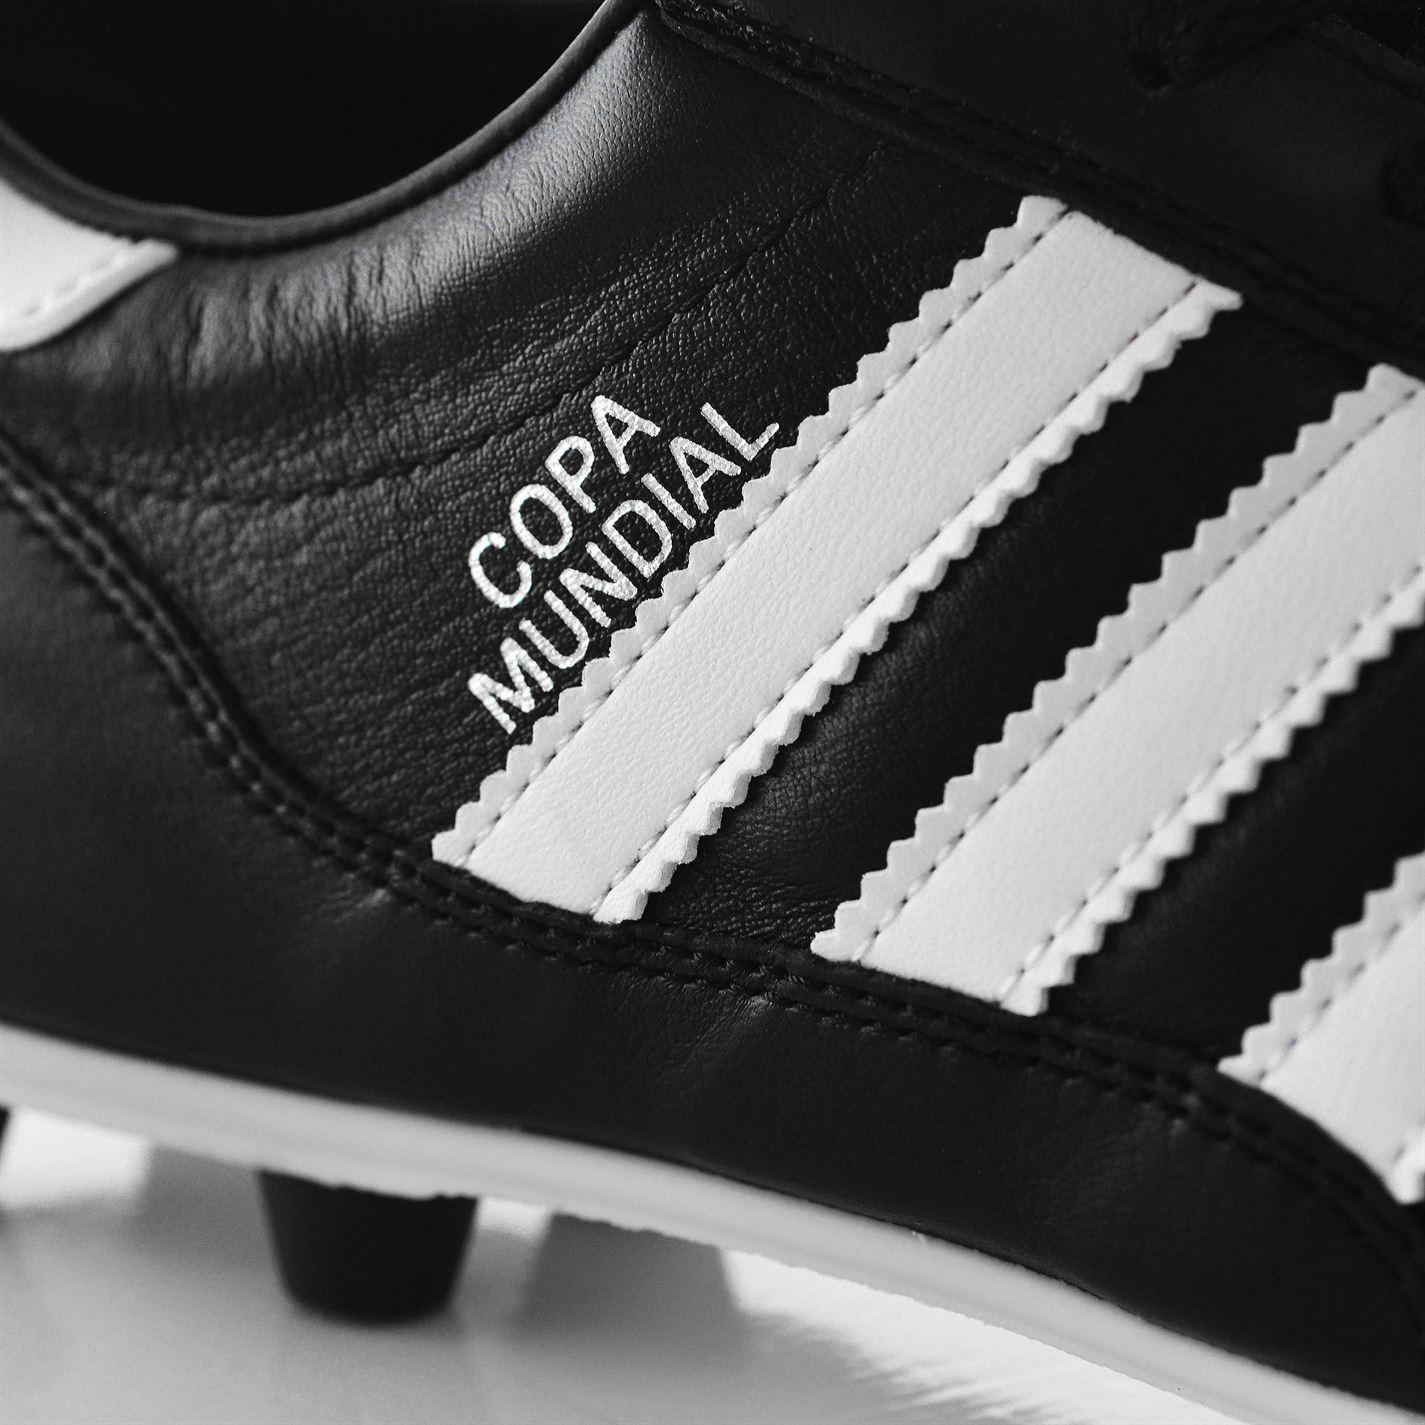 d4e76df8 adidas Copa Mundial FG Training Soccer Football Boots Lace Up Gents Mens 5  5 di 6 ...